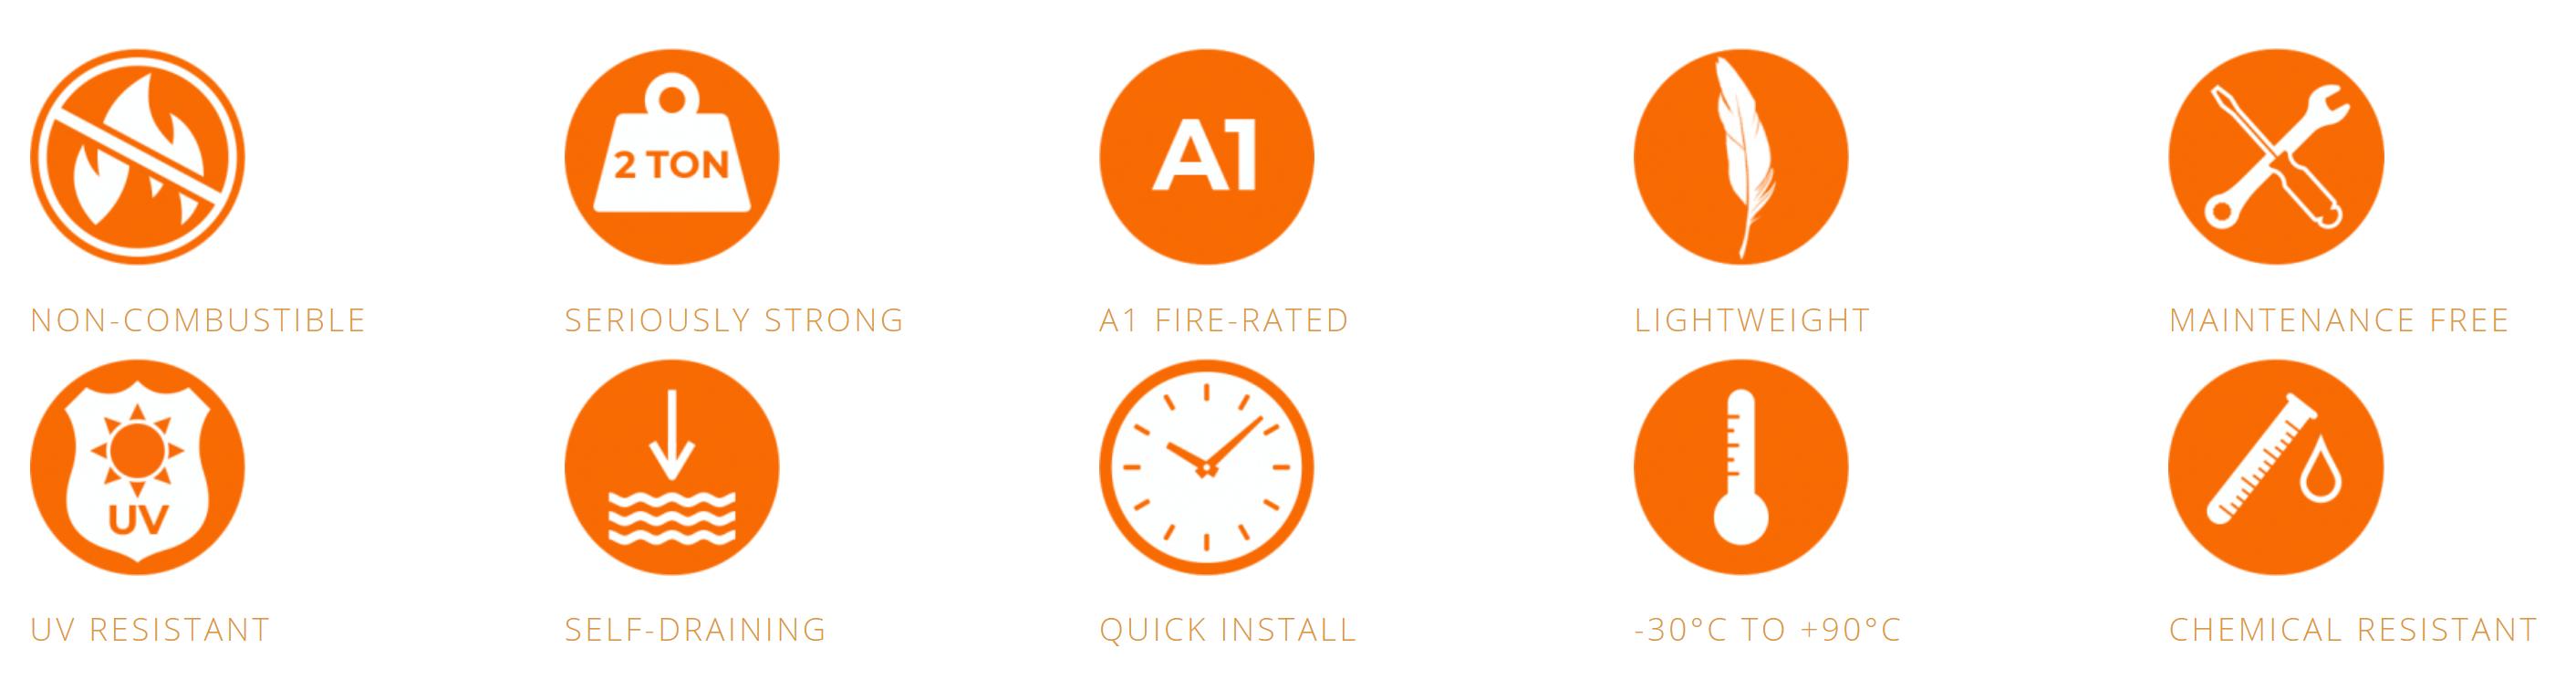 A-PED performance characteristics